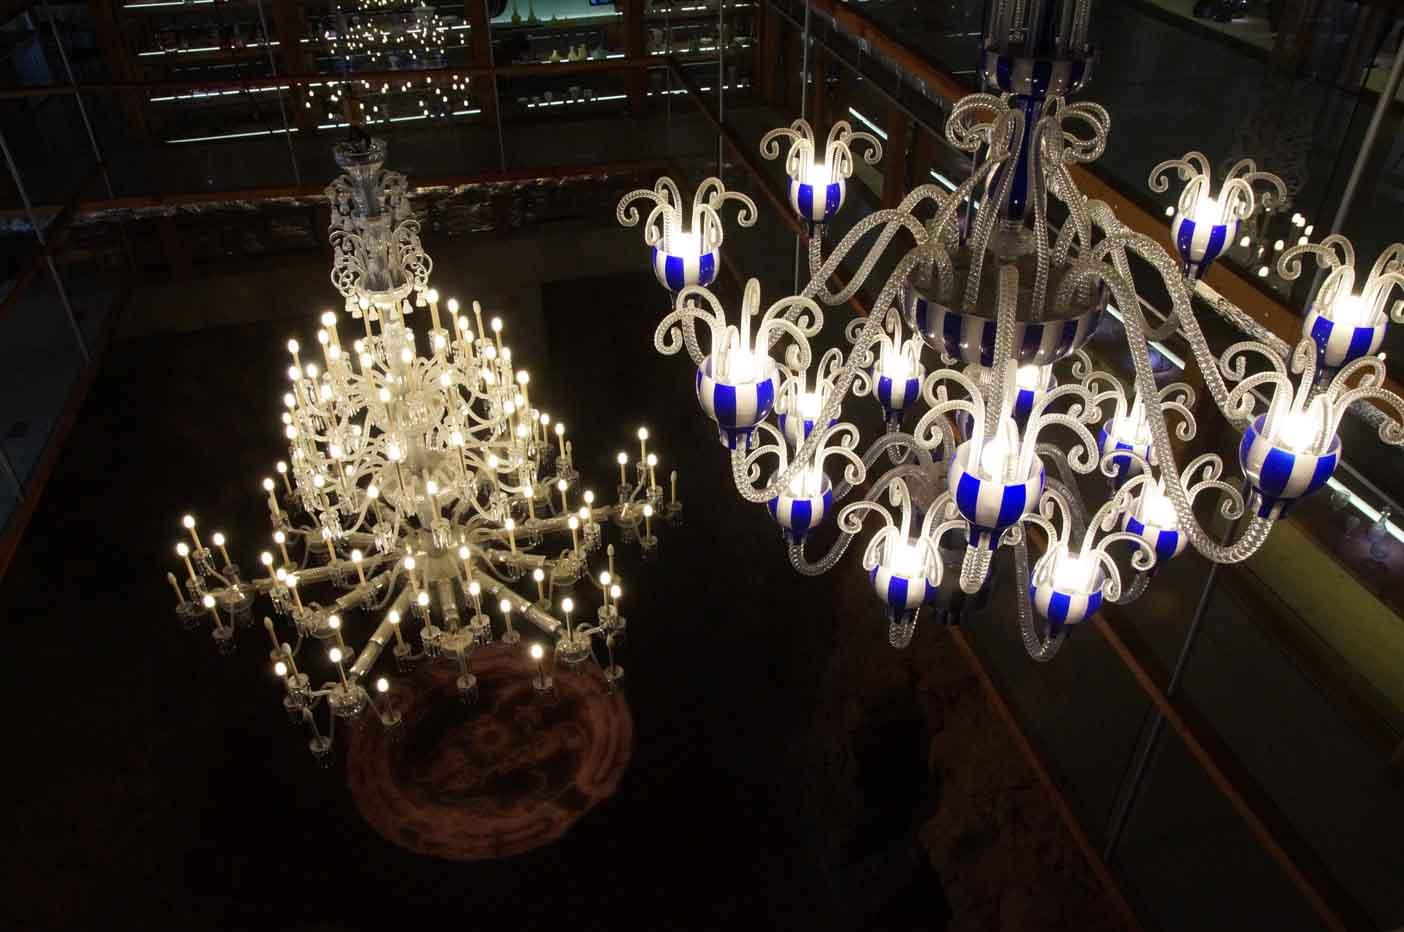 kristalmuseum van Saint-Louis